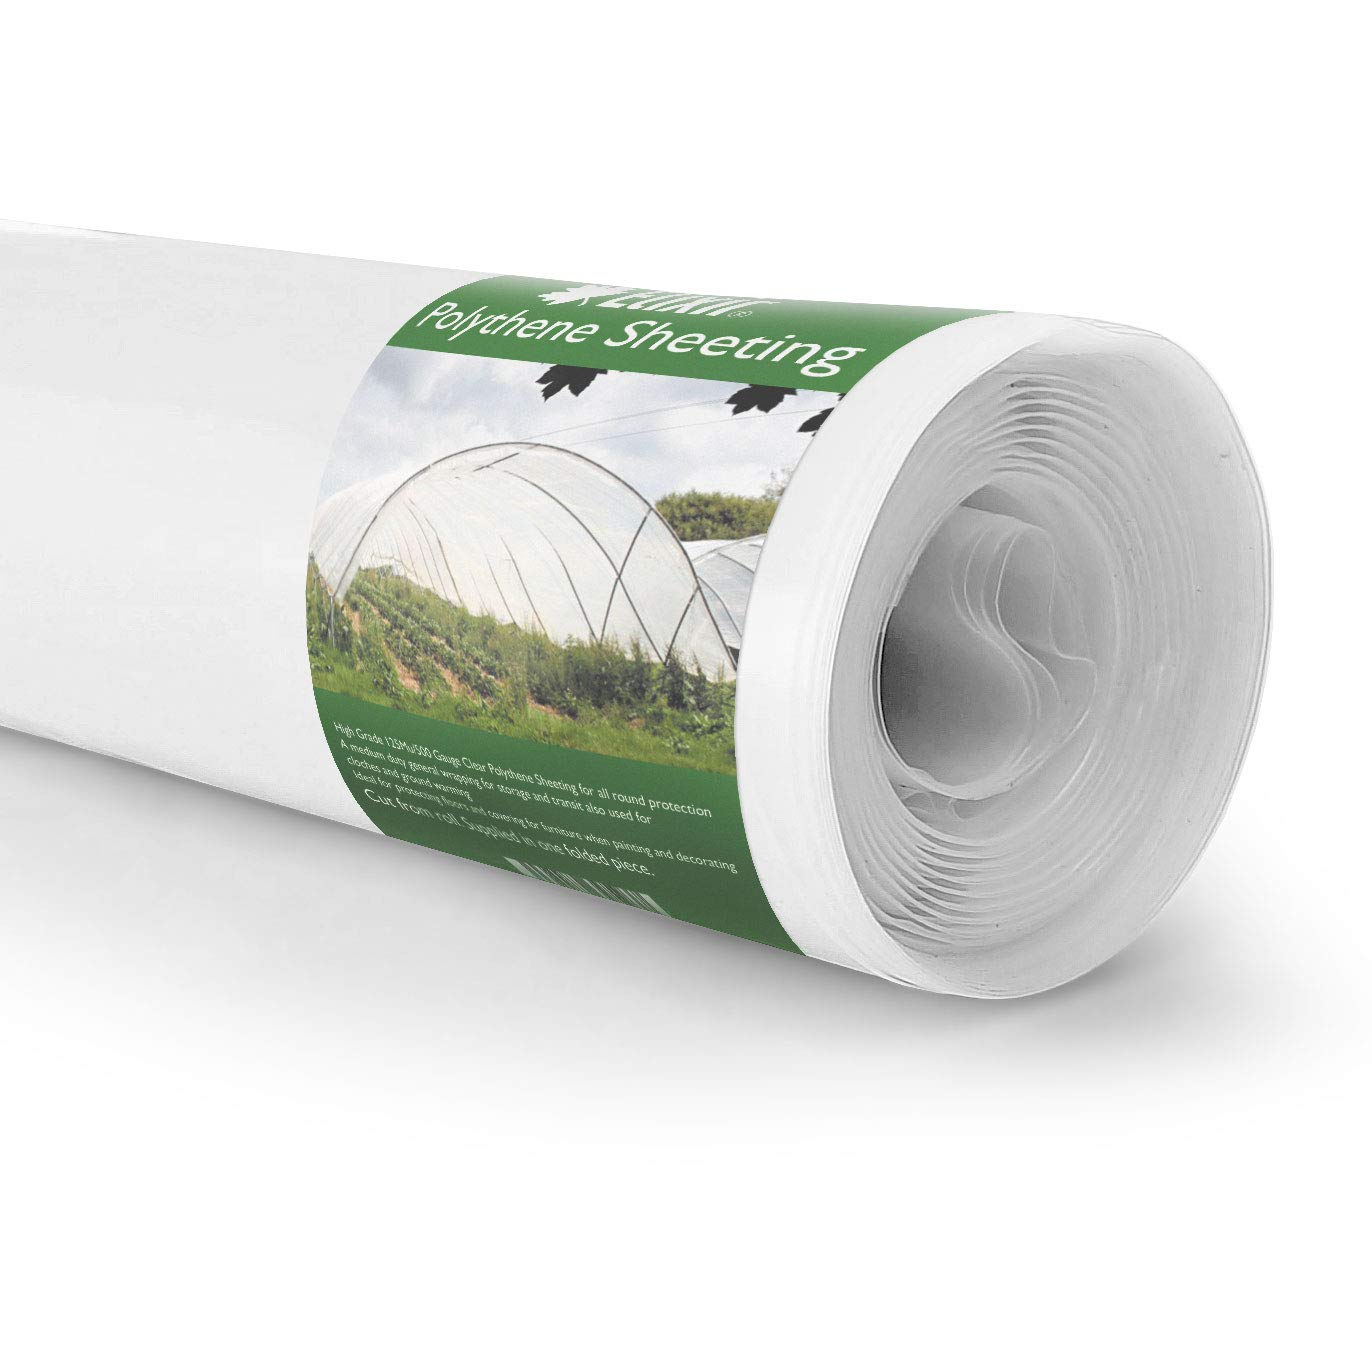 QVS Shop 4M X 10M Black Polythene Sheeting 125Mu 500G Plastic Sheet Protection Cover